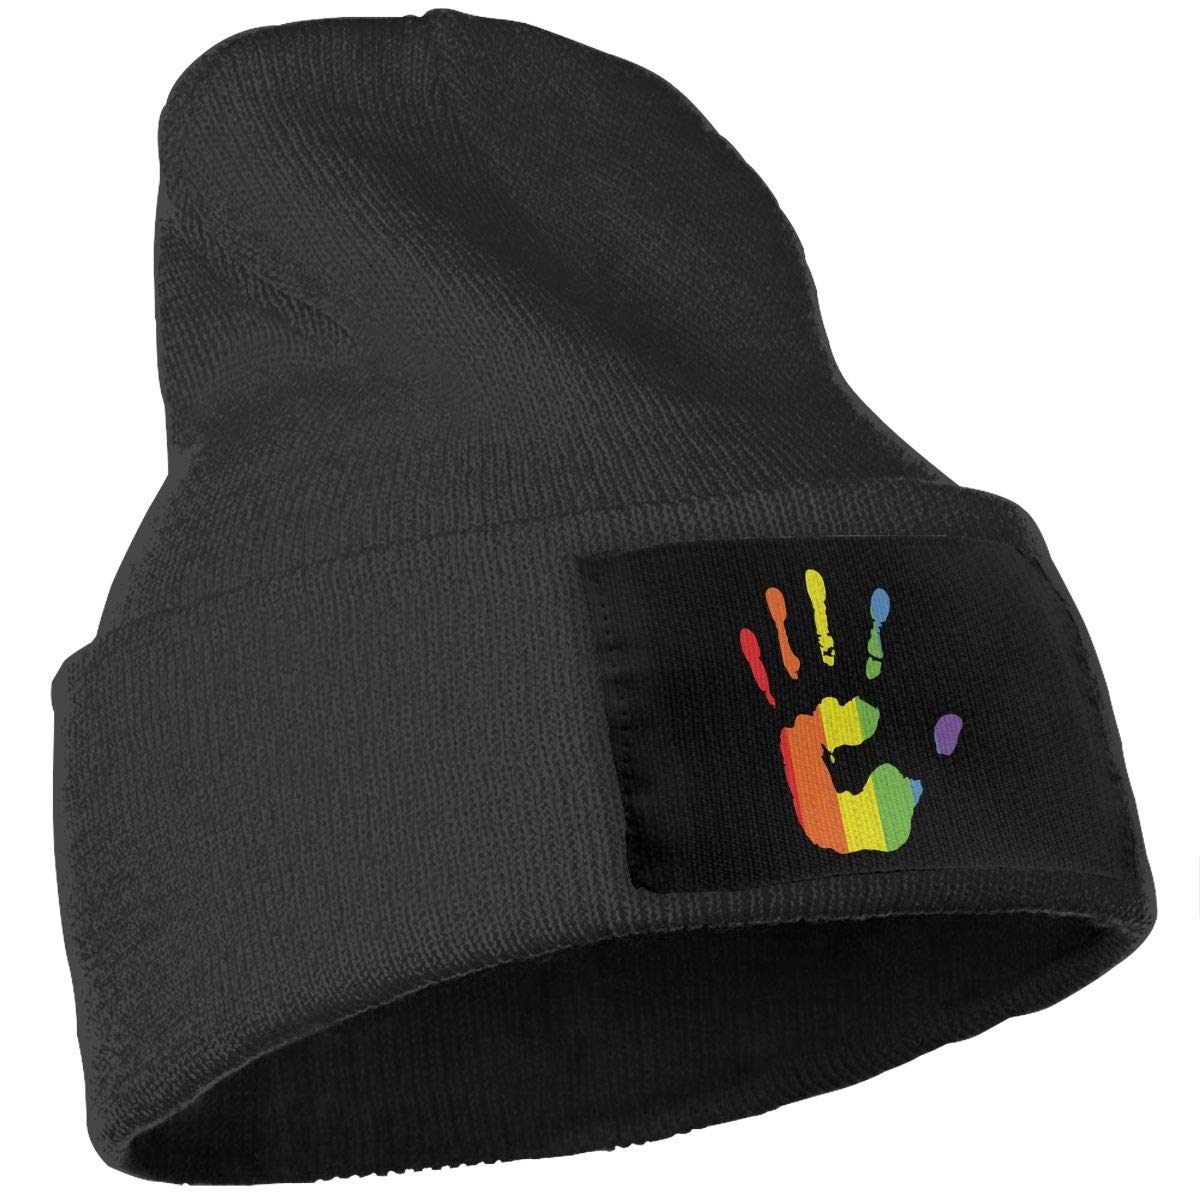 Men /& Women Gay Pride Rainbow Hand Outdoor Stretch Knit Beanies Hat Soft Winter Skull Caps